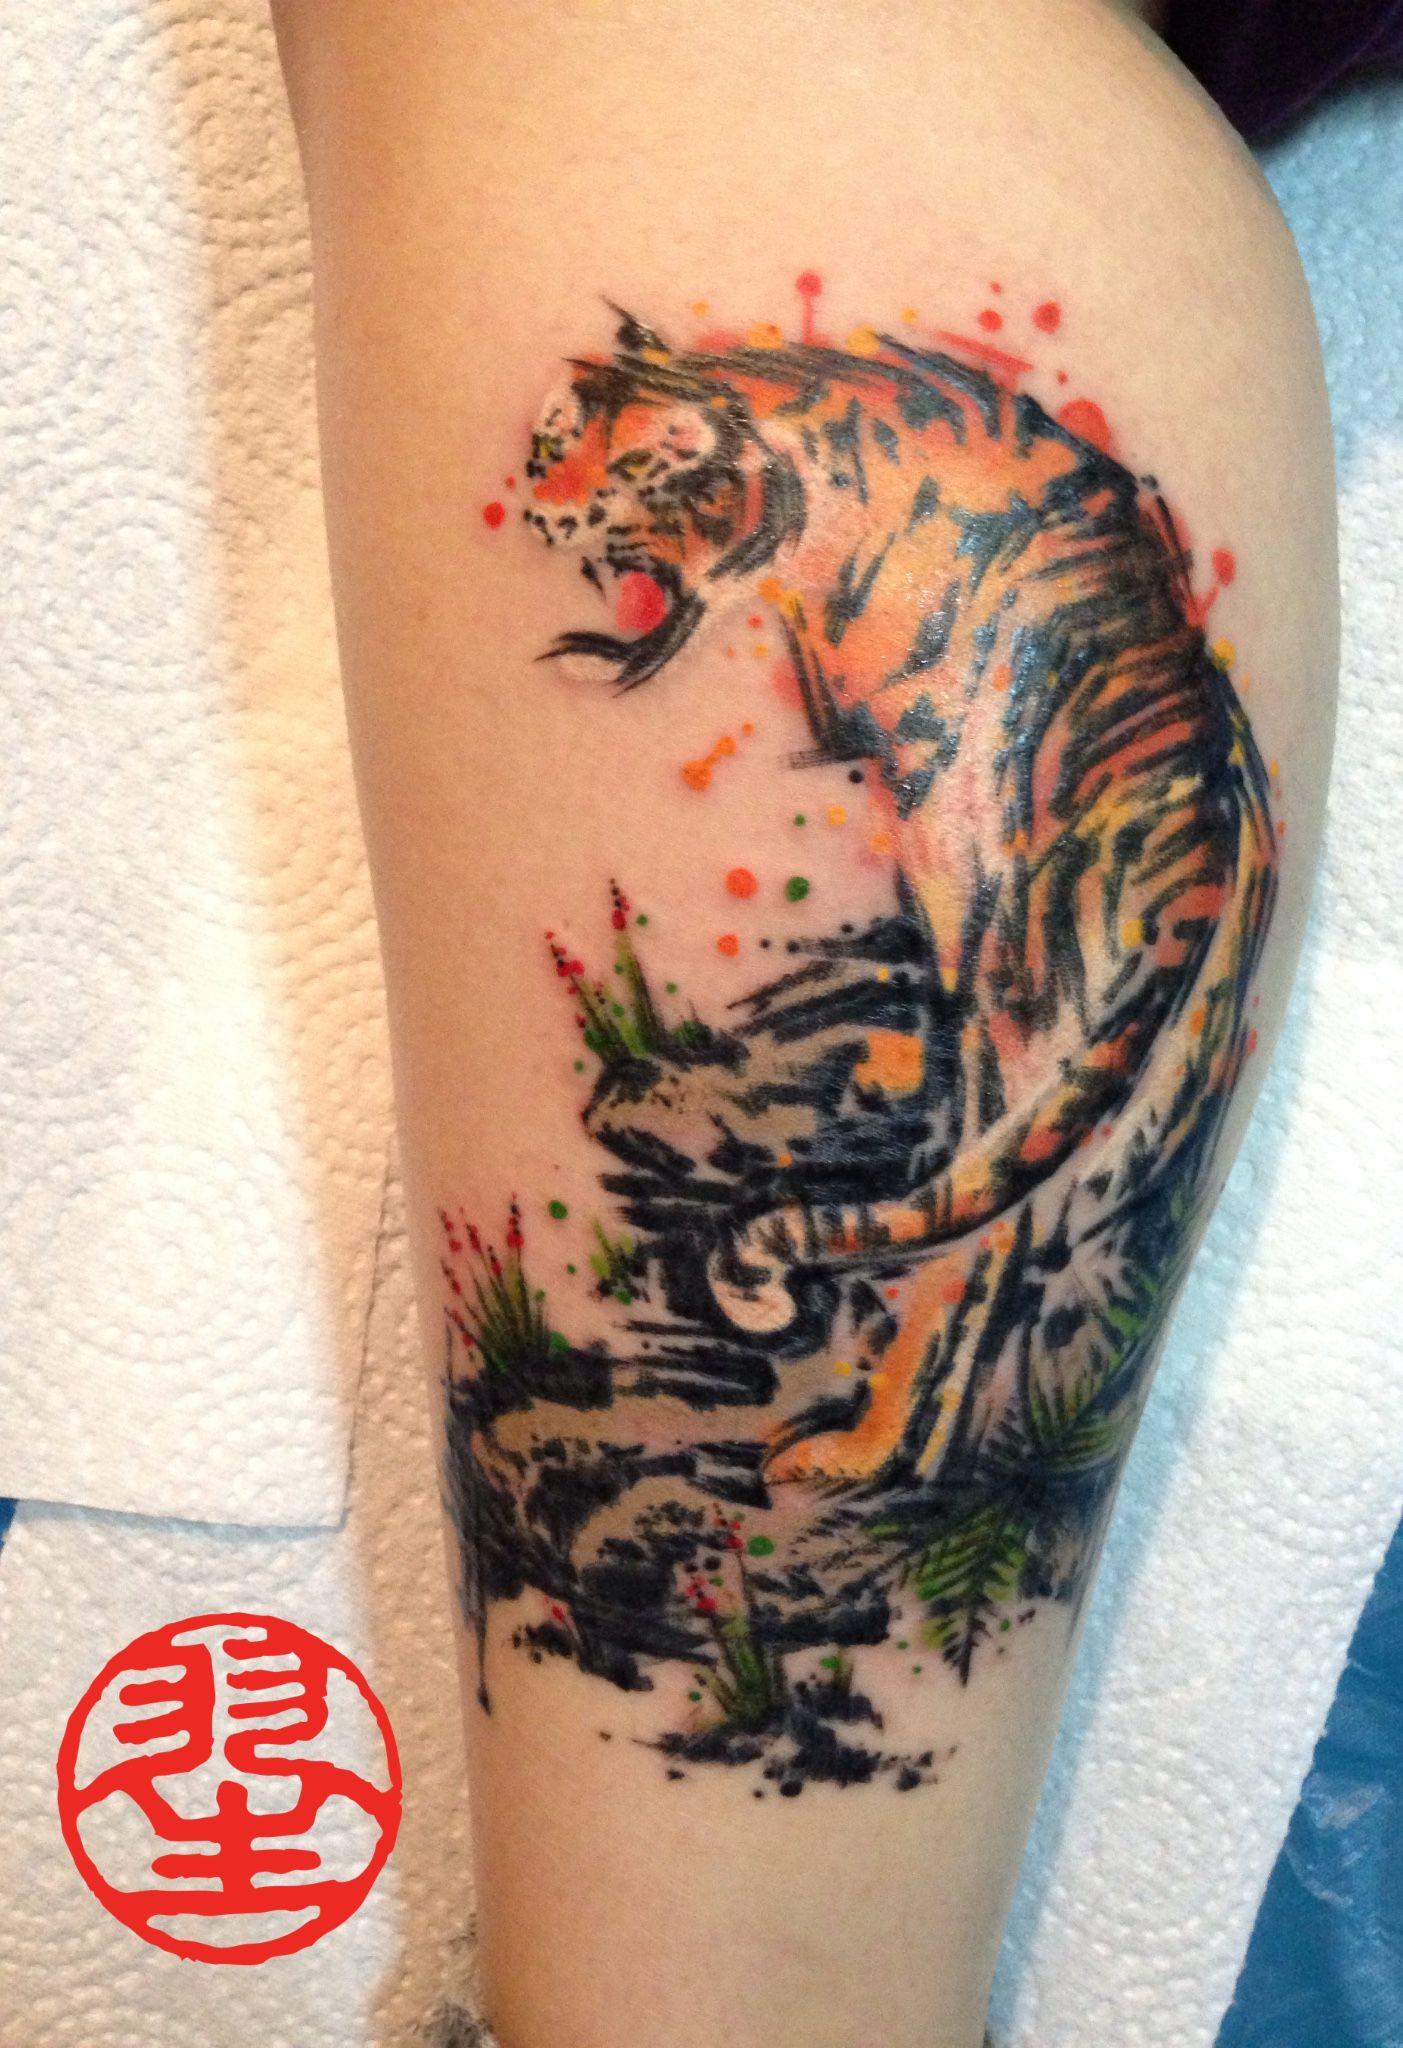 Watercolour Tattoo Tiger auf der Wade / Fuss Watercolor